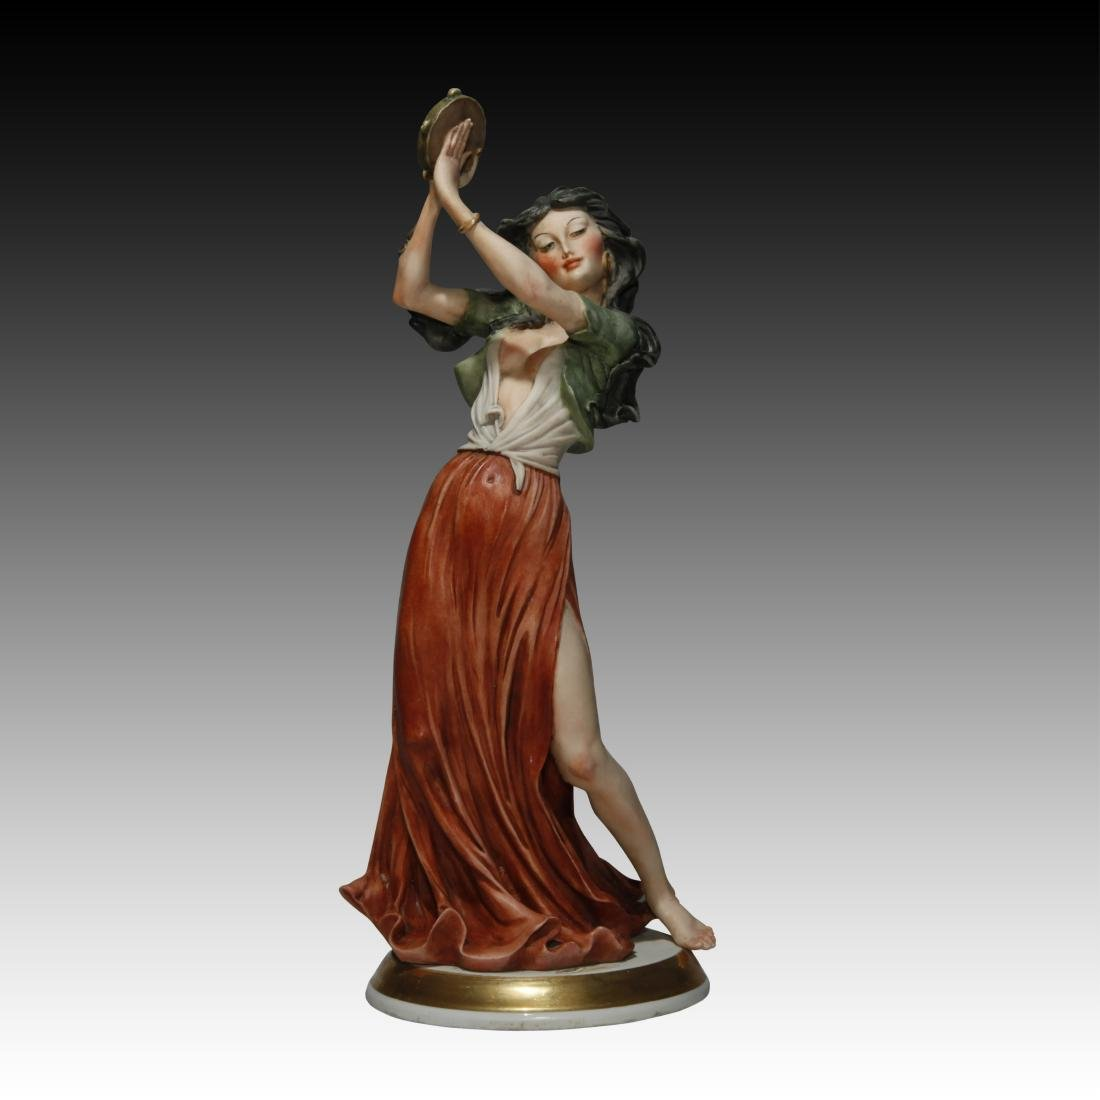 Capodimonte Figurine of a Gypsy Girl